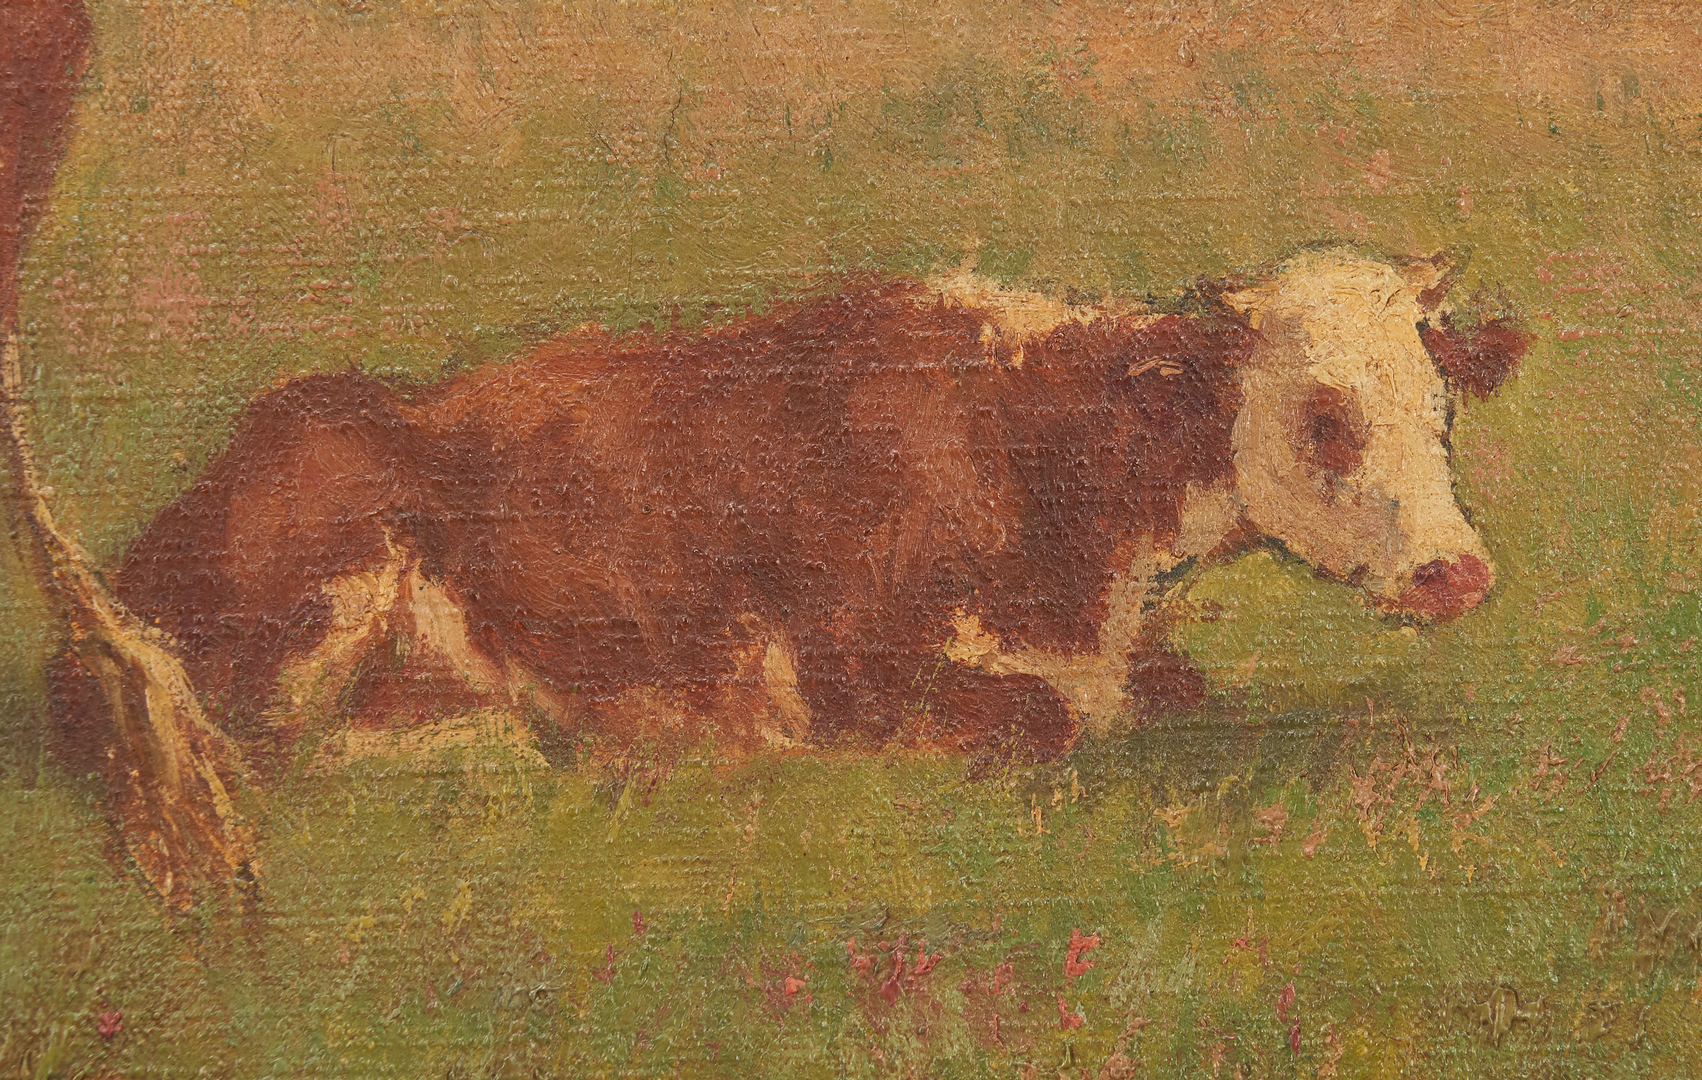 Lot 193: Matilda Lotz, o/c painting of Cattle